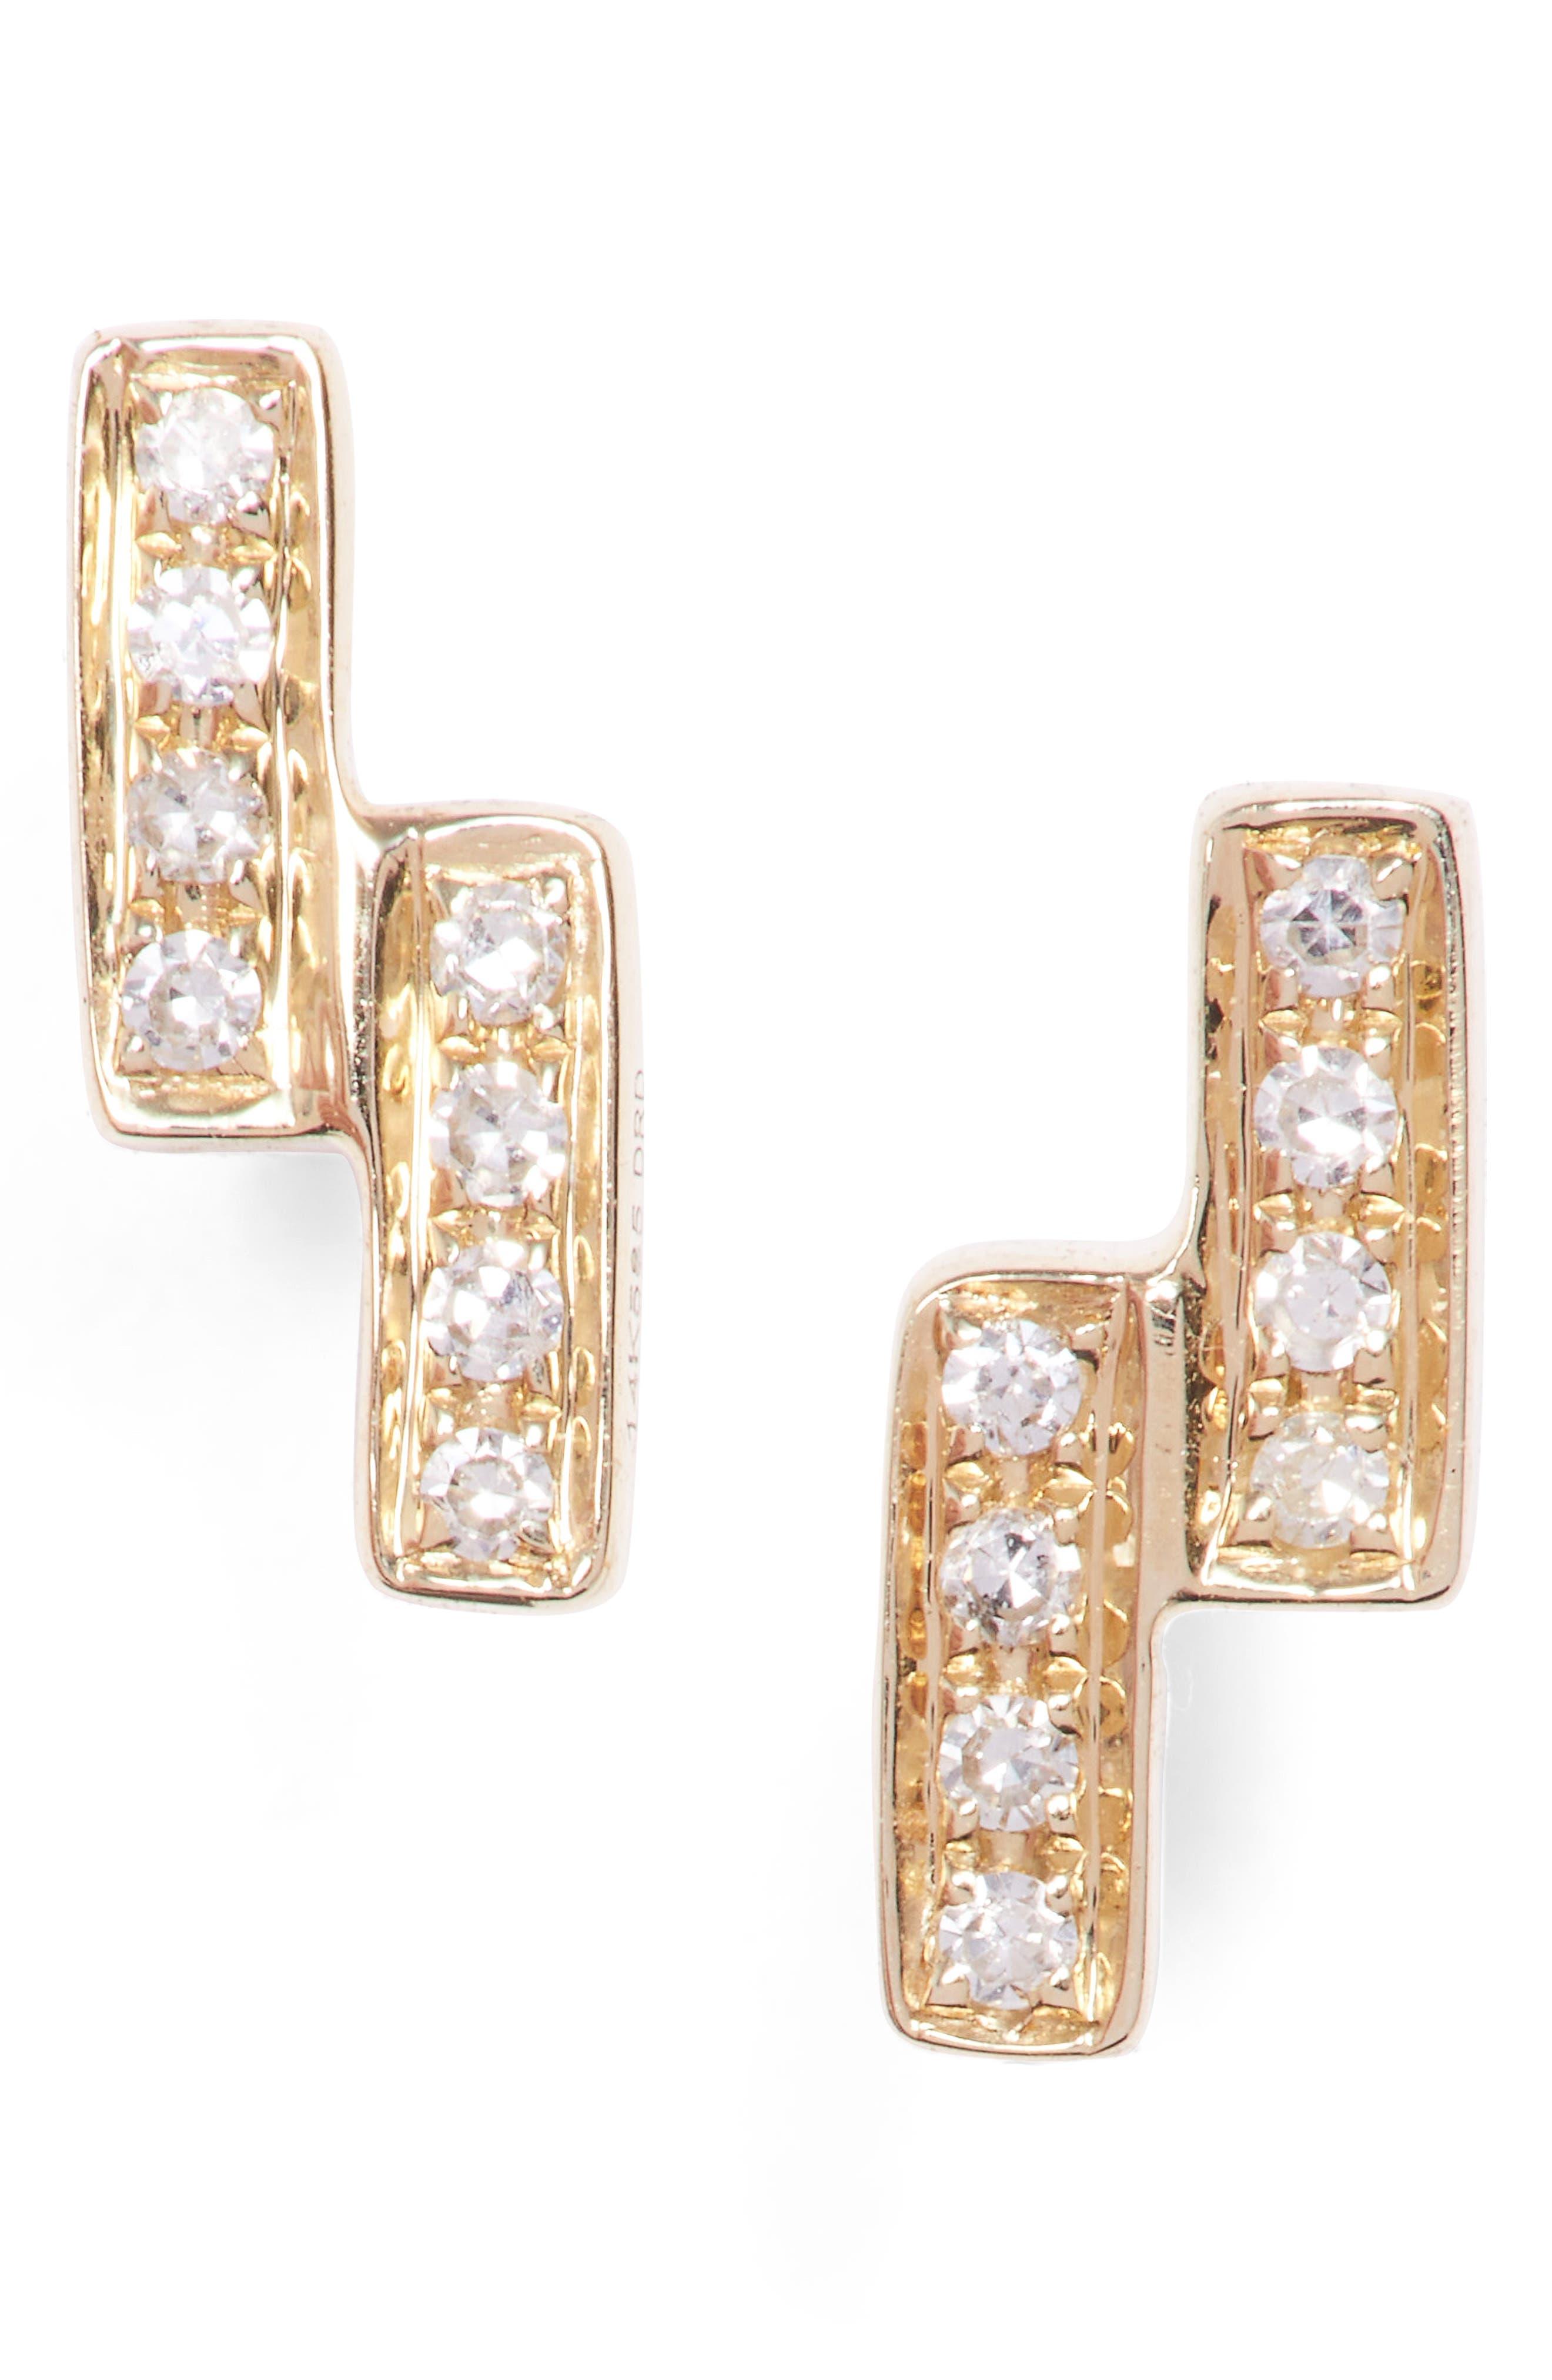 Dana Rebecca Designs Sylvie Rose Double Bar Diamond Earrings